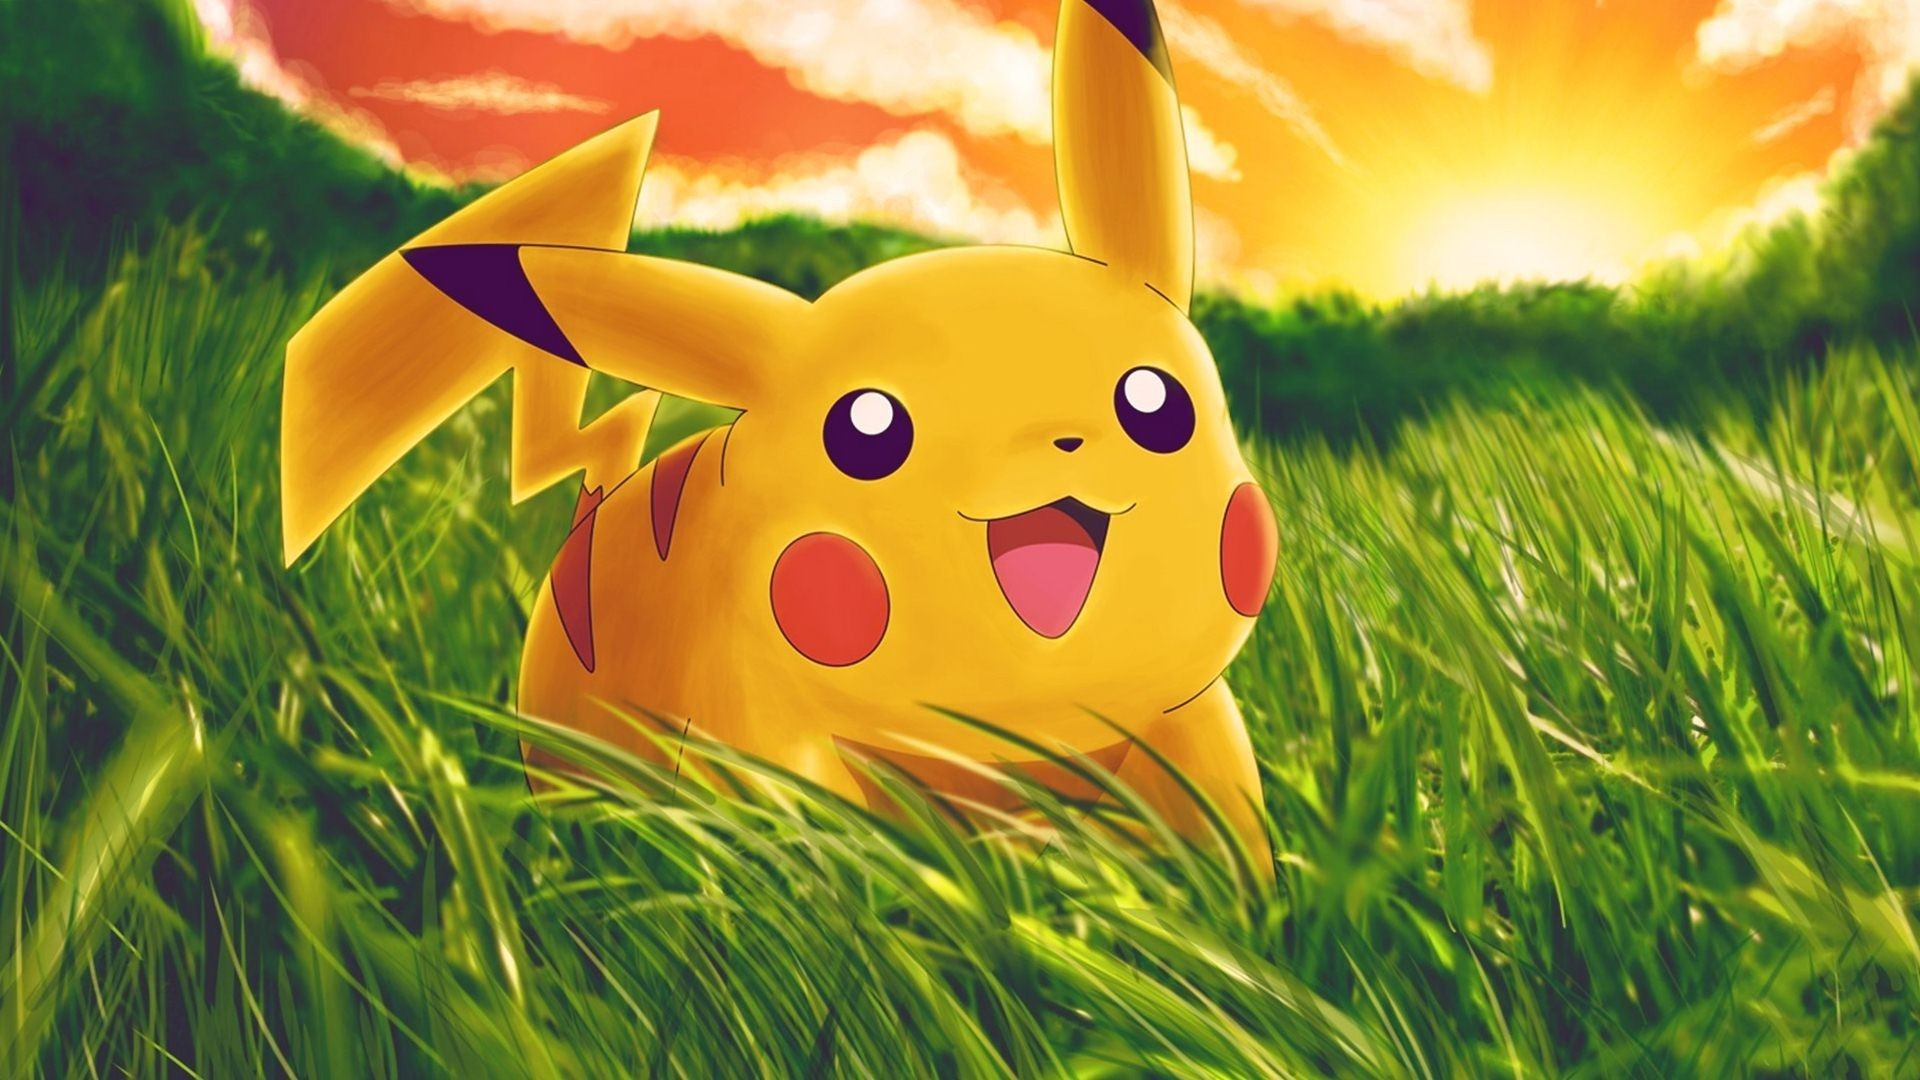 Cute Pikachu Wallpapers Desktop Wallpaper Box